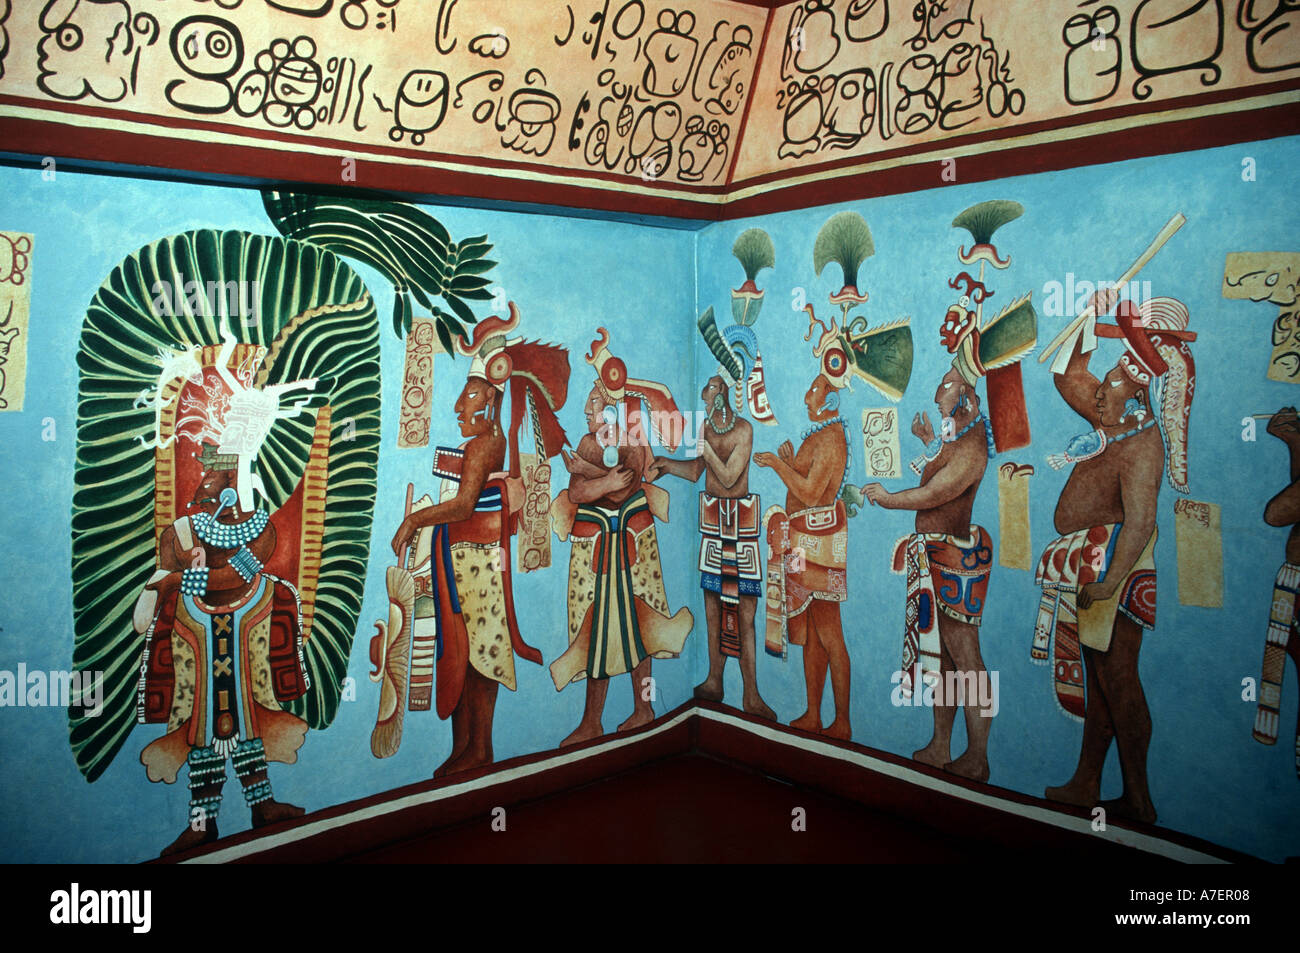 Jungle Wall Mural Mexico Nuevo Leon Monterrey Museum Of Mexican History